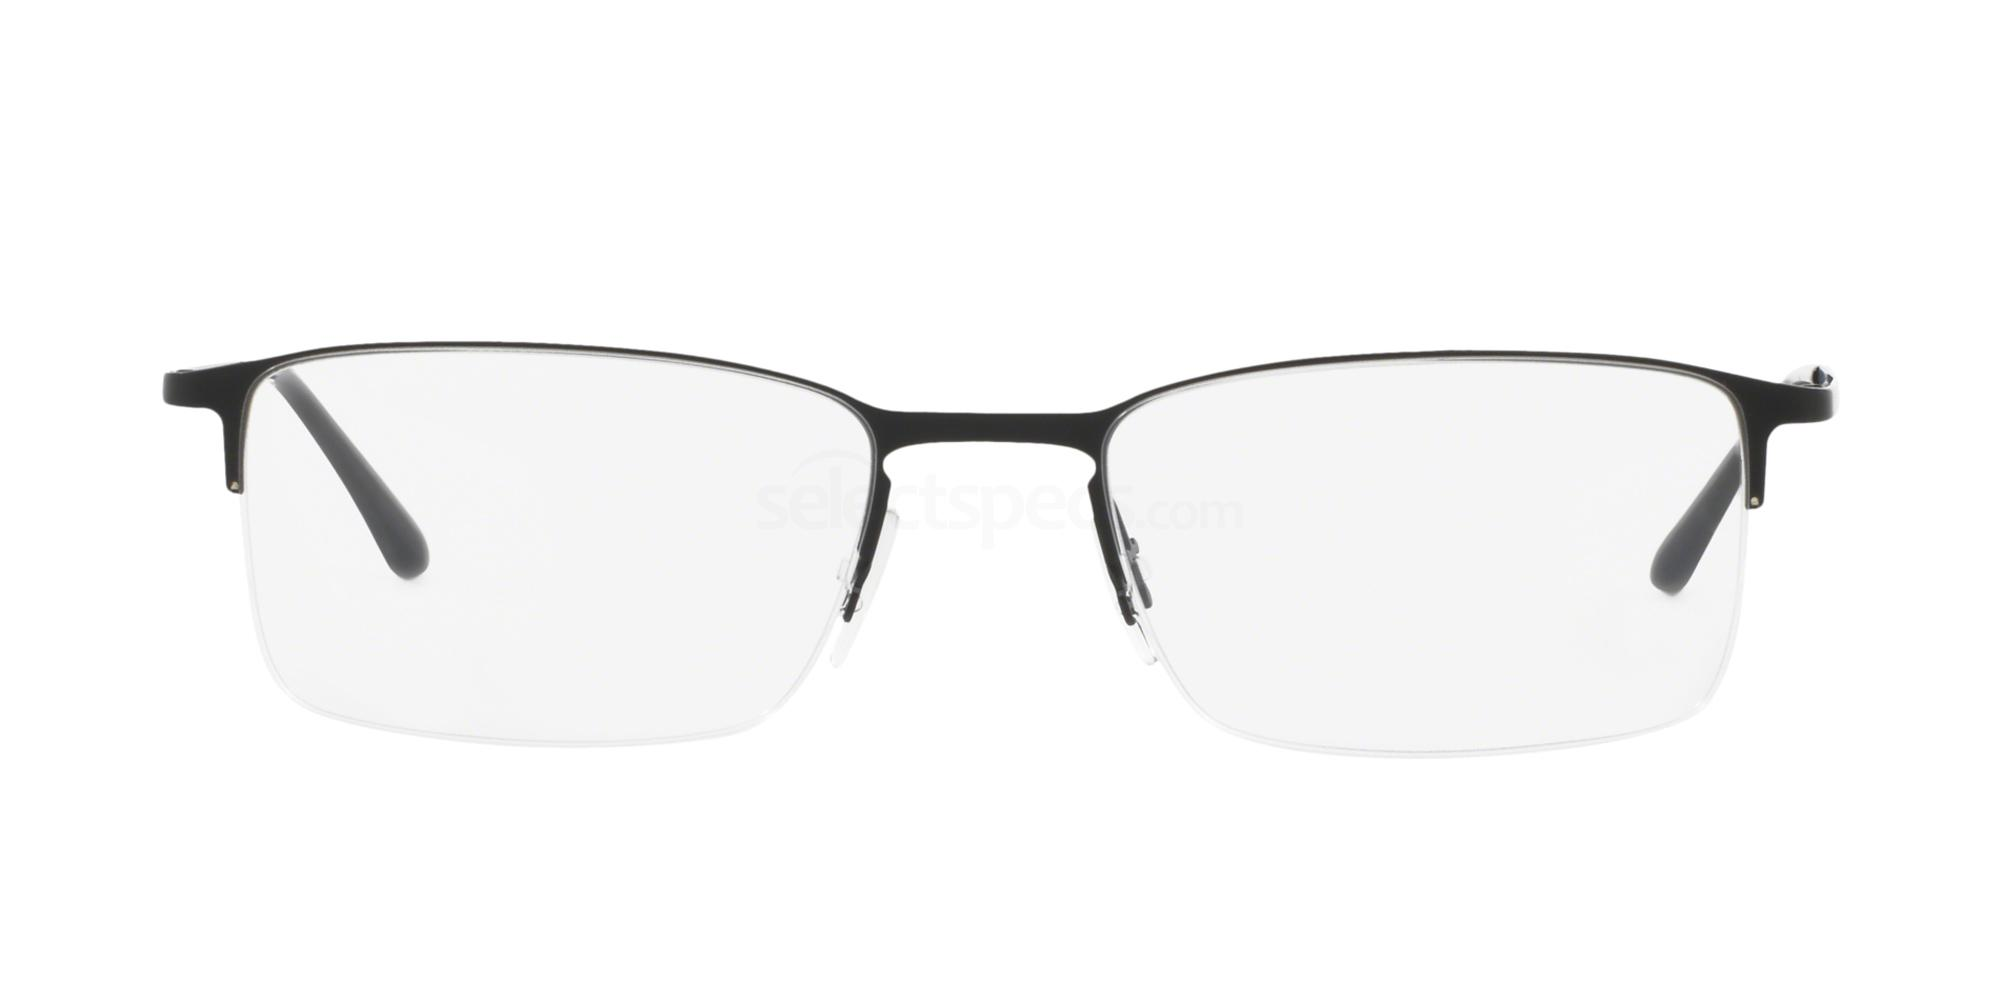 3001 AR5010 Glasses, Giorgio Armani